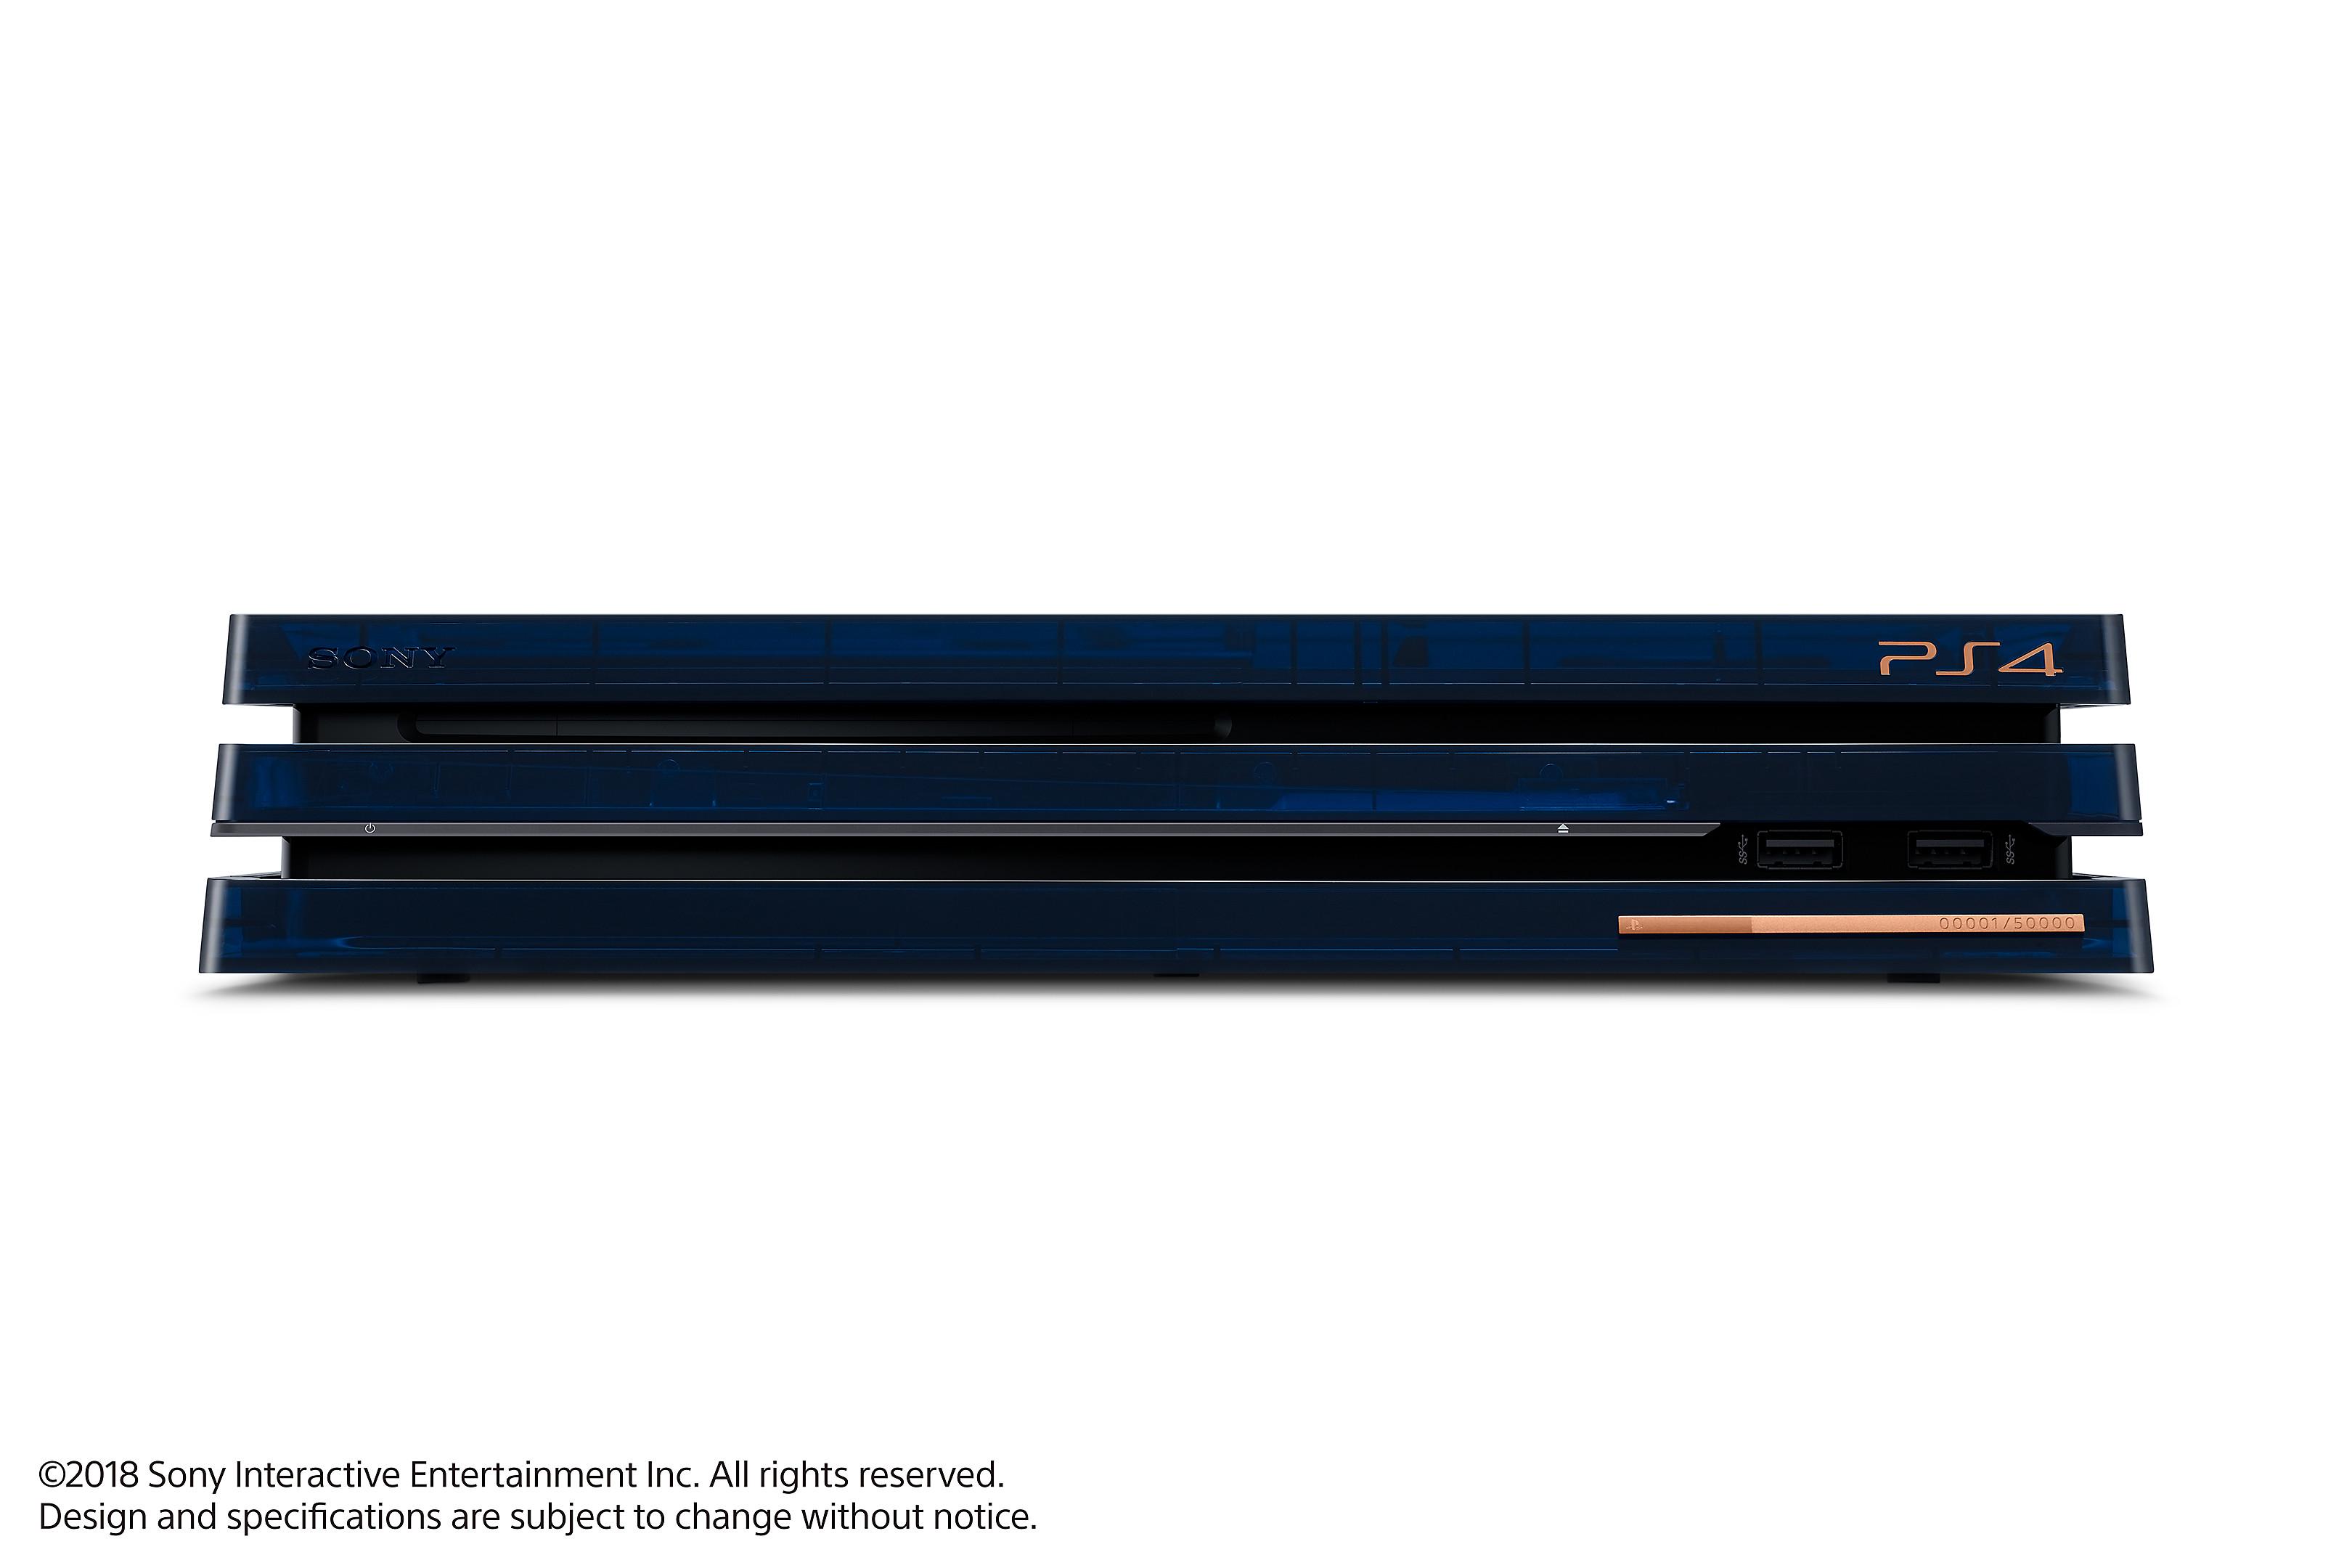 sony playstation 4 pro 2tb 500 million limited edition